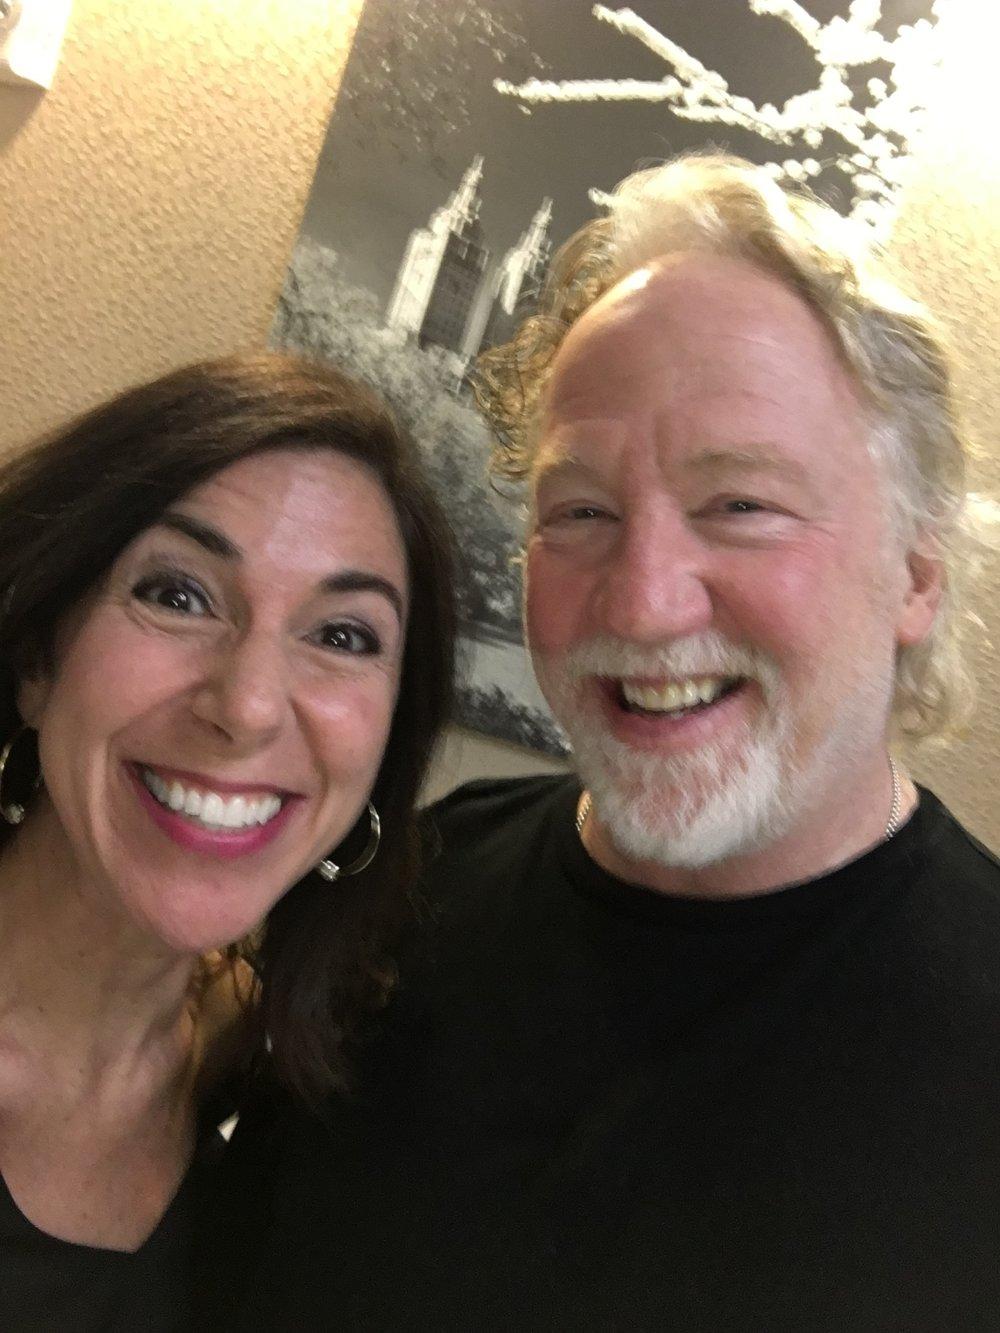 Kara and Tim Busfield FUN.JPG